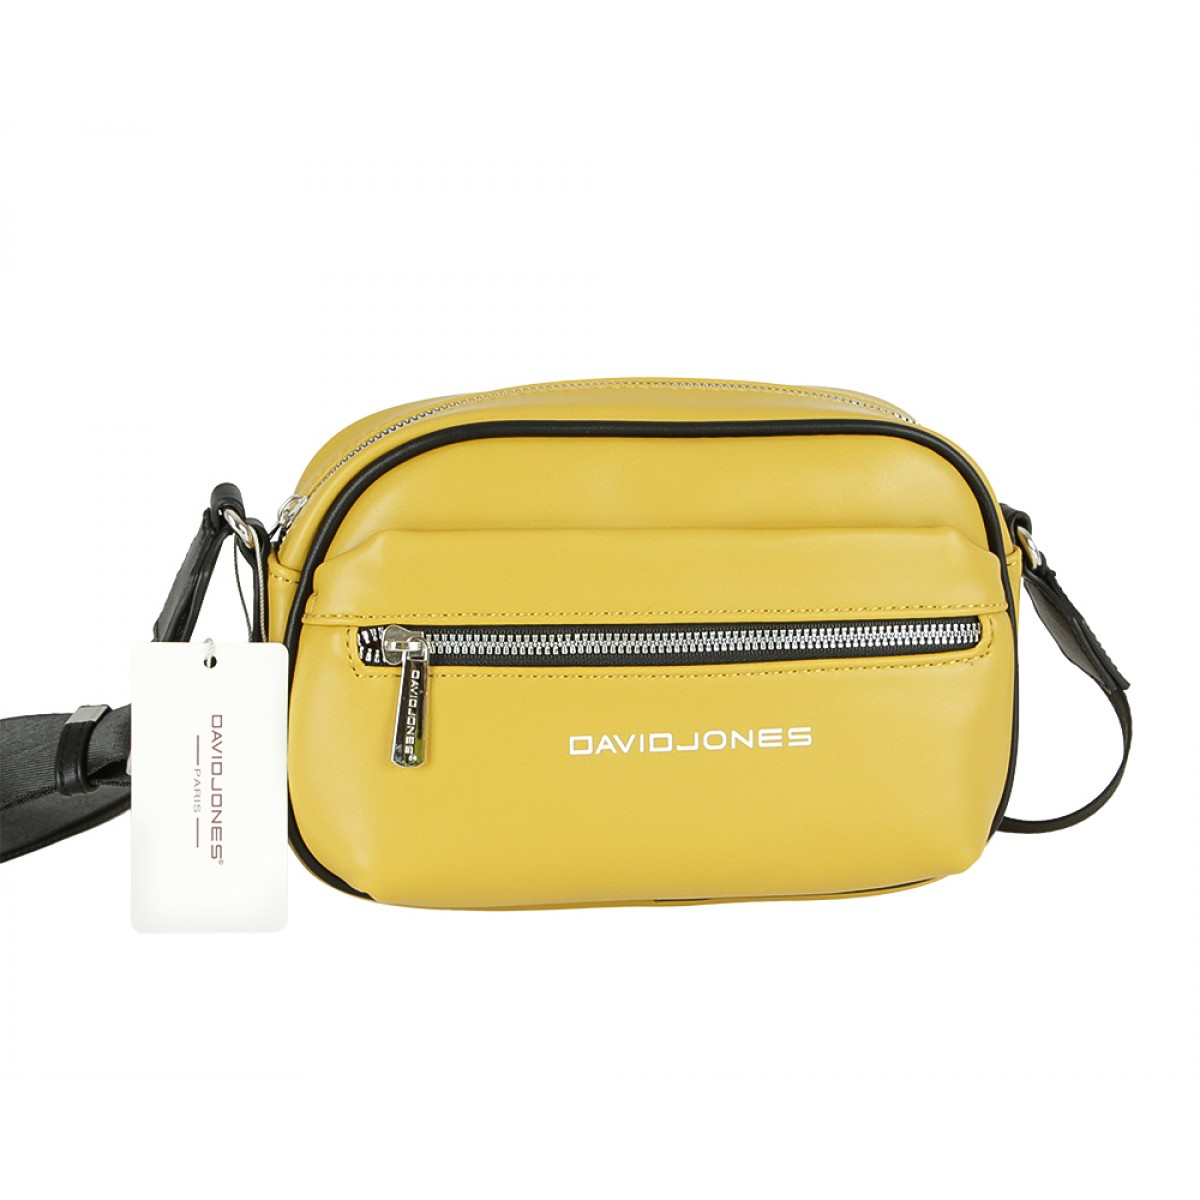 Жіноча сумка David Jones 6208-1 MUSTARD